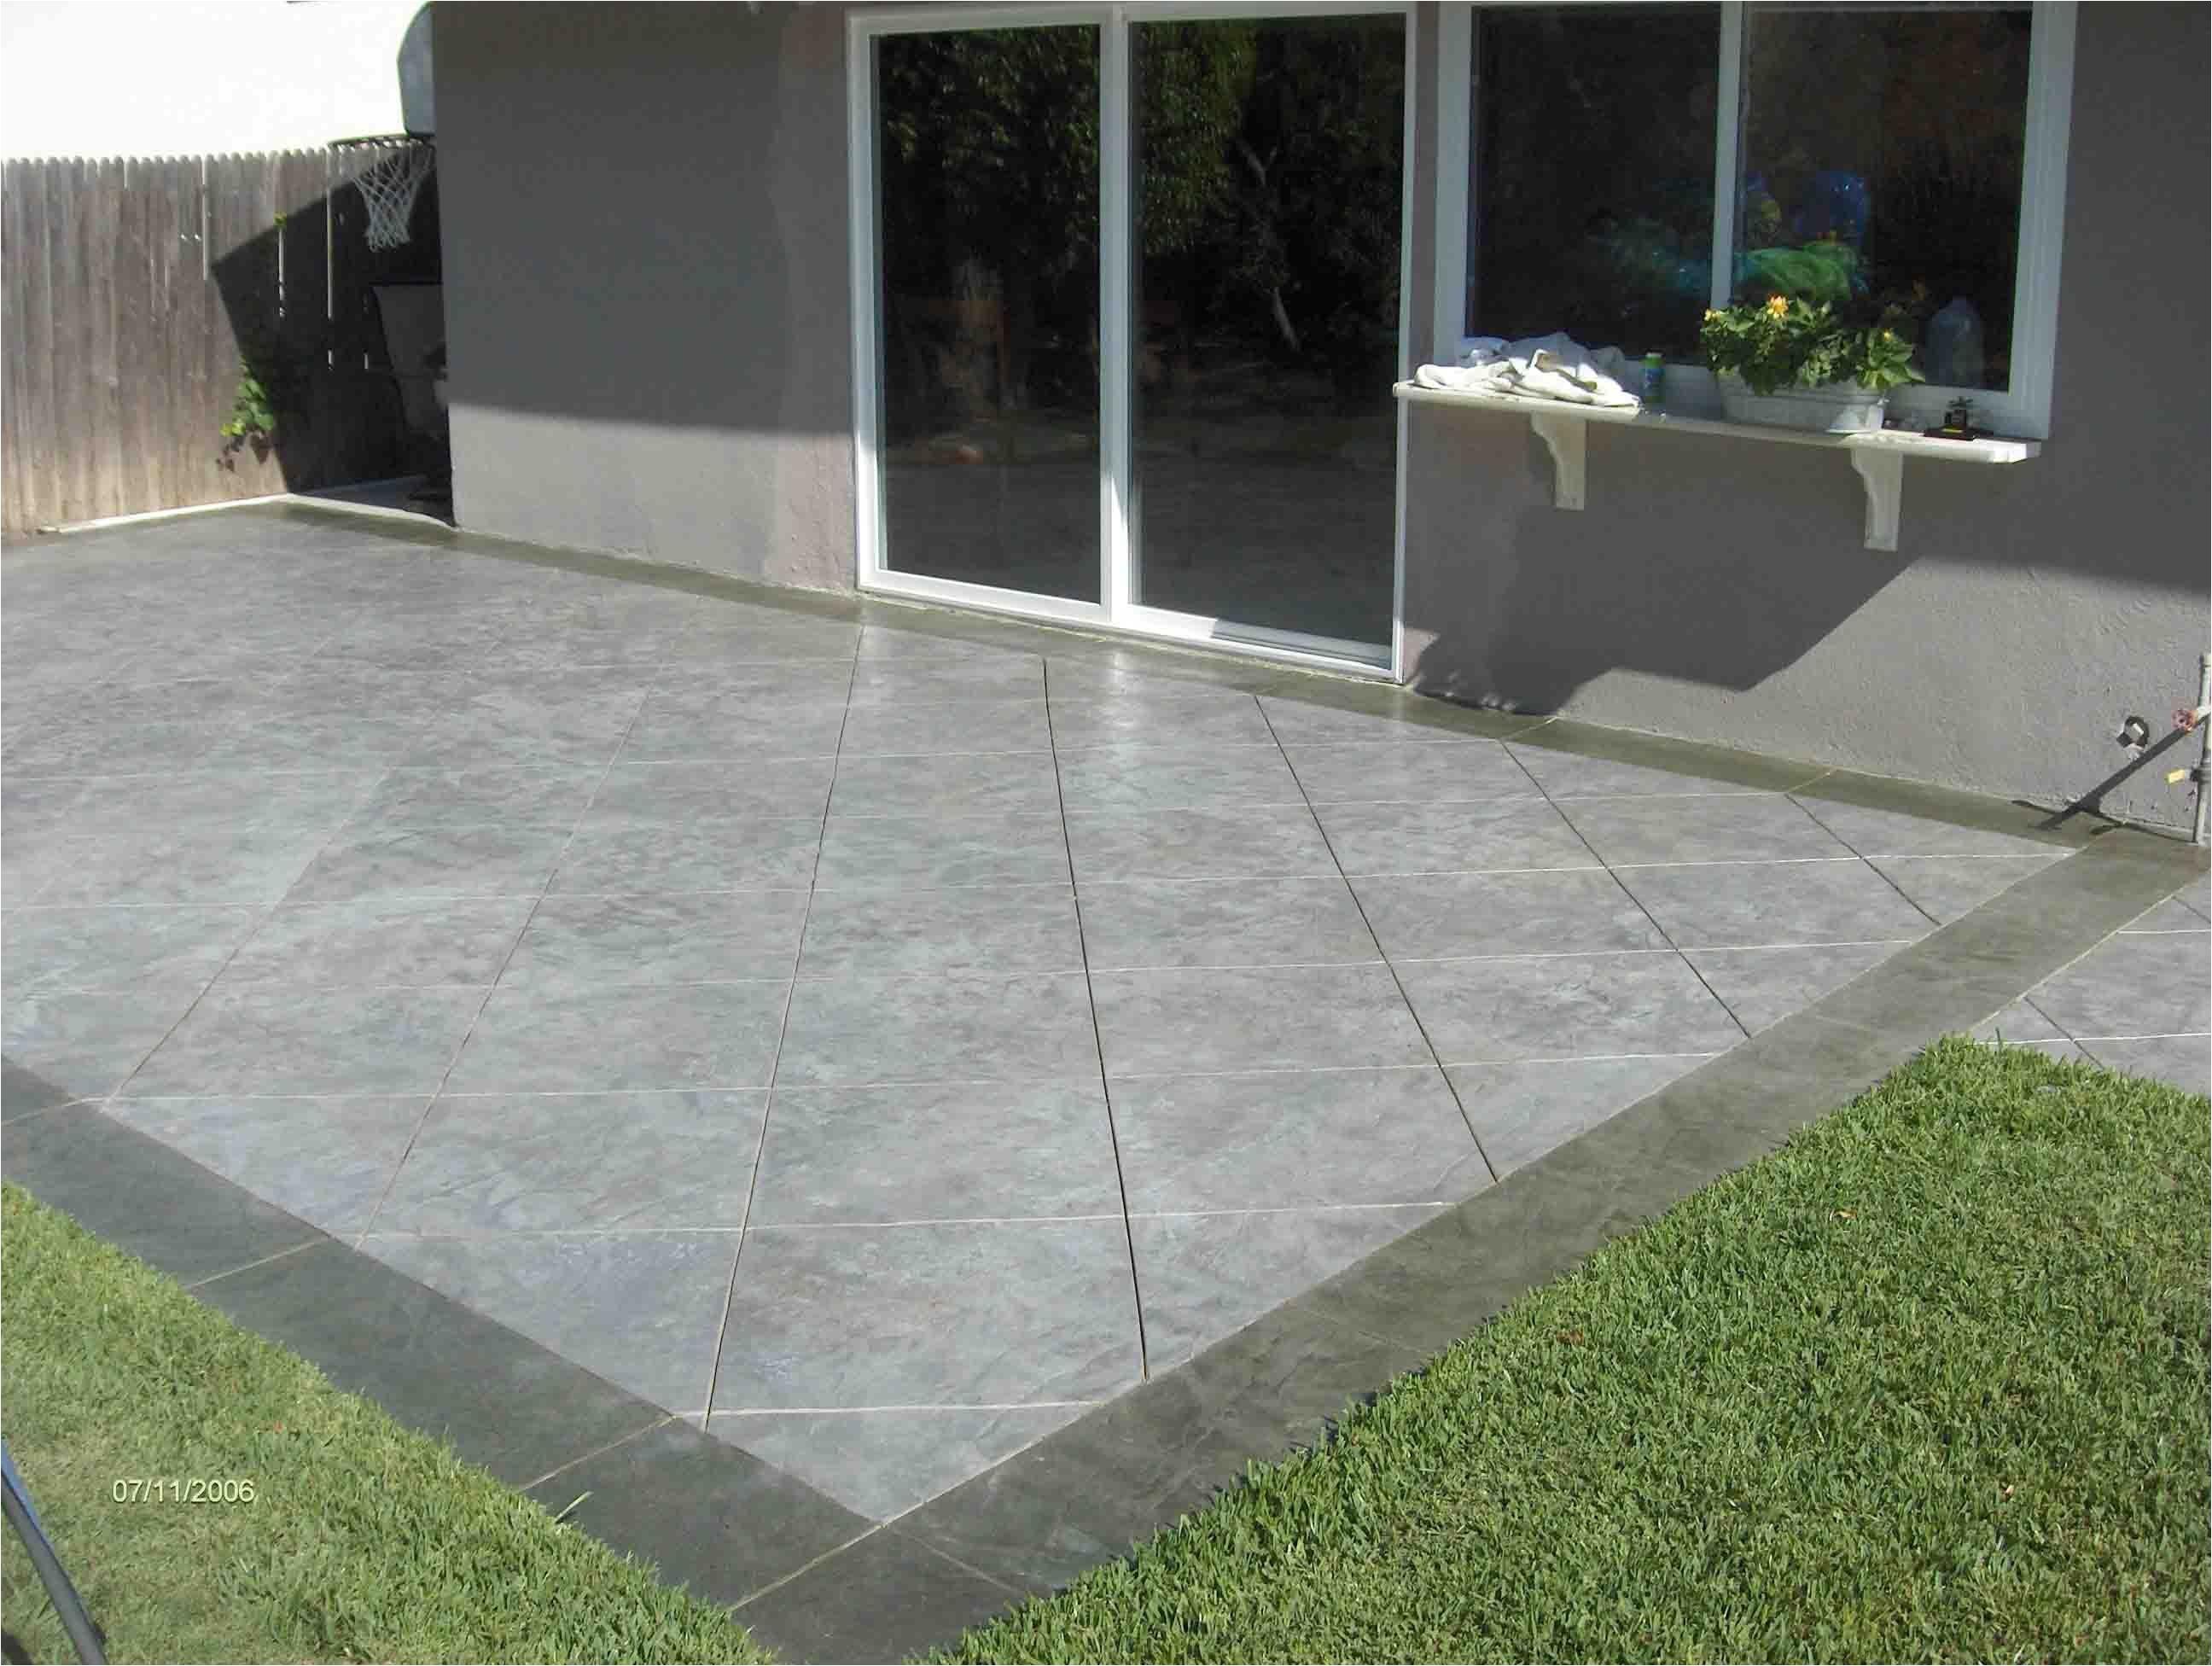 Decorative Concrete Blocks For Sale Uk Paver Patios Interlocking Concrete  Pavers Contemporary Patio Large